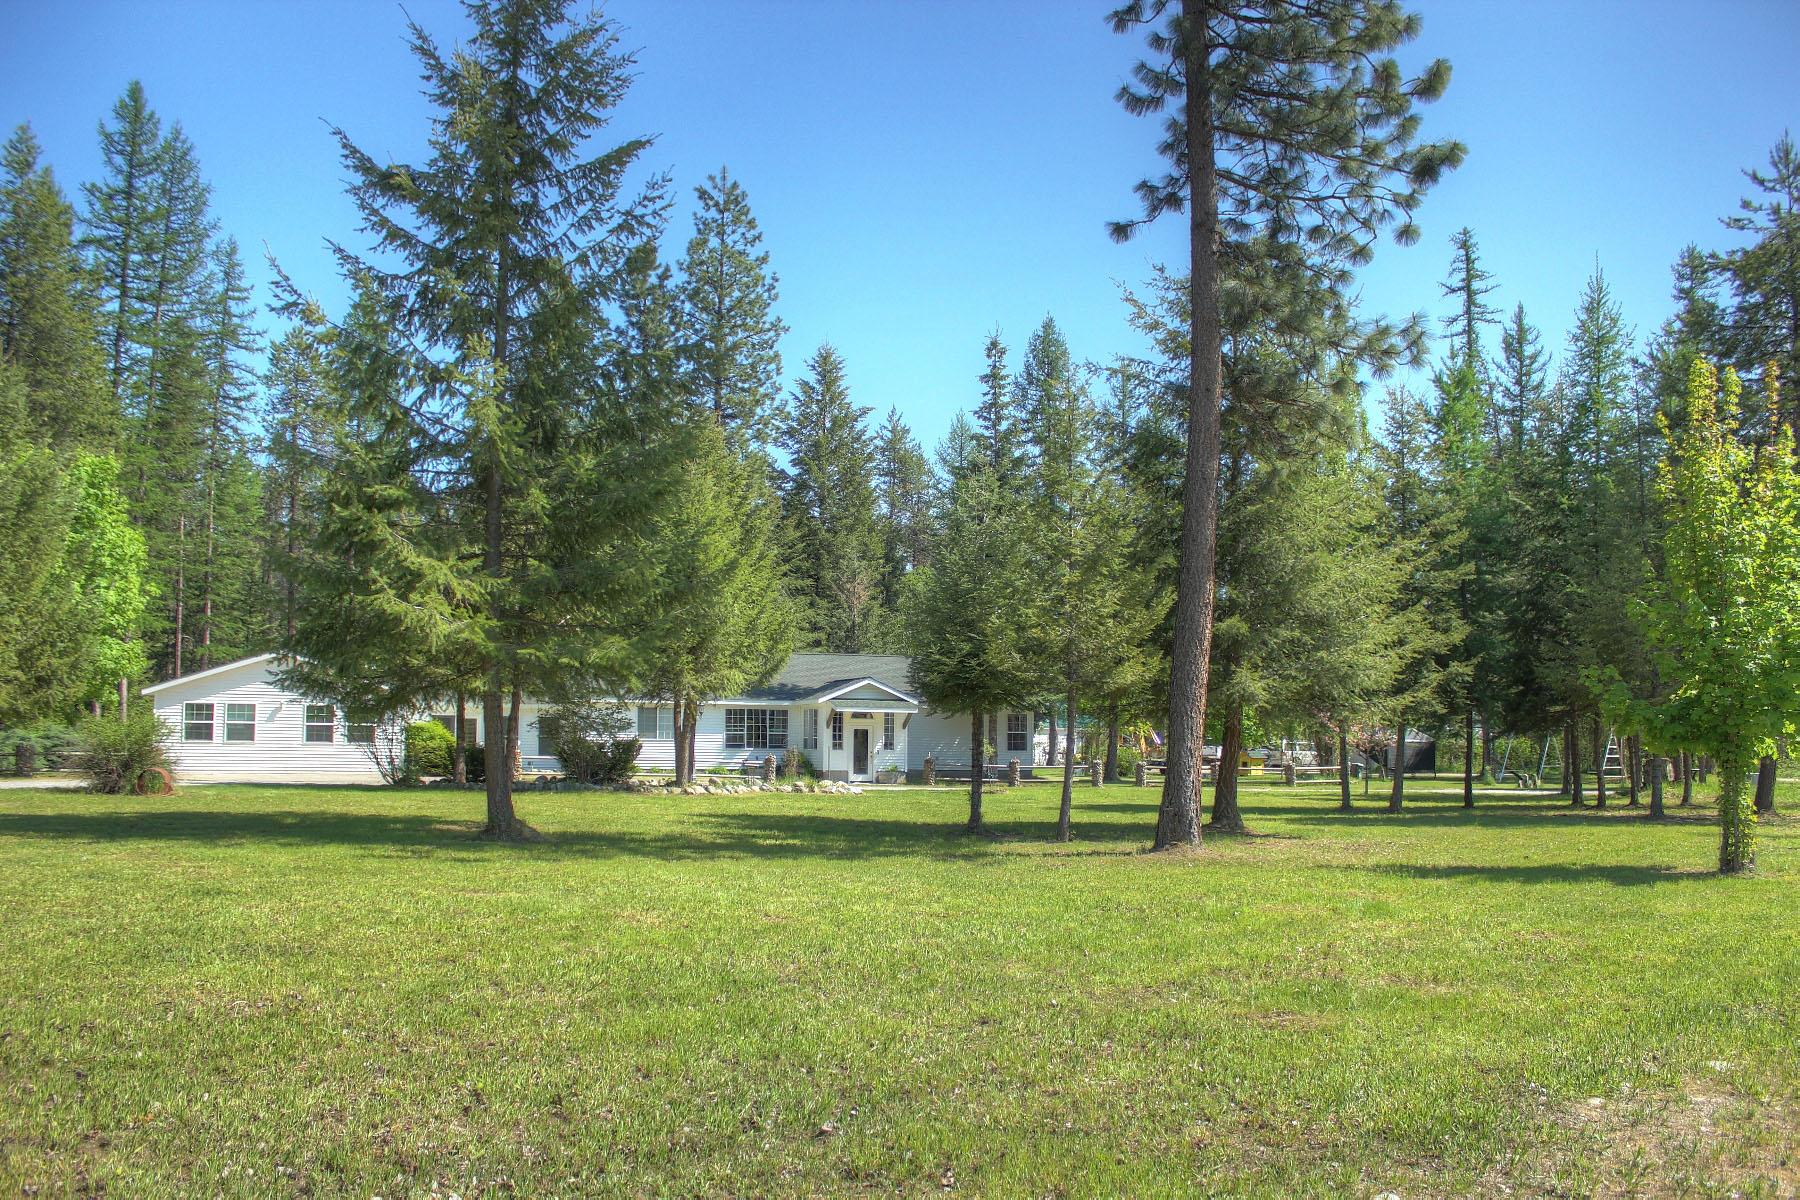 Moradia para Venda às Pristine ranch style home located on 4.95 acres 147 Shepard Rd Oldtown, Idaho, 83822 Estados Unidos